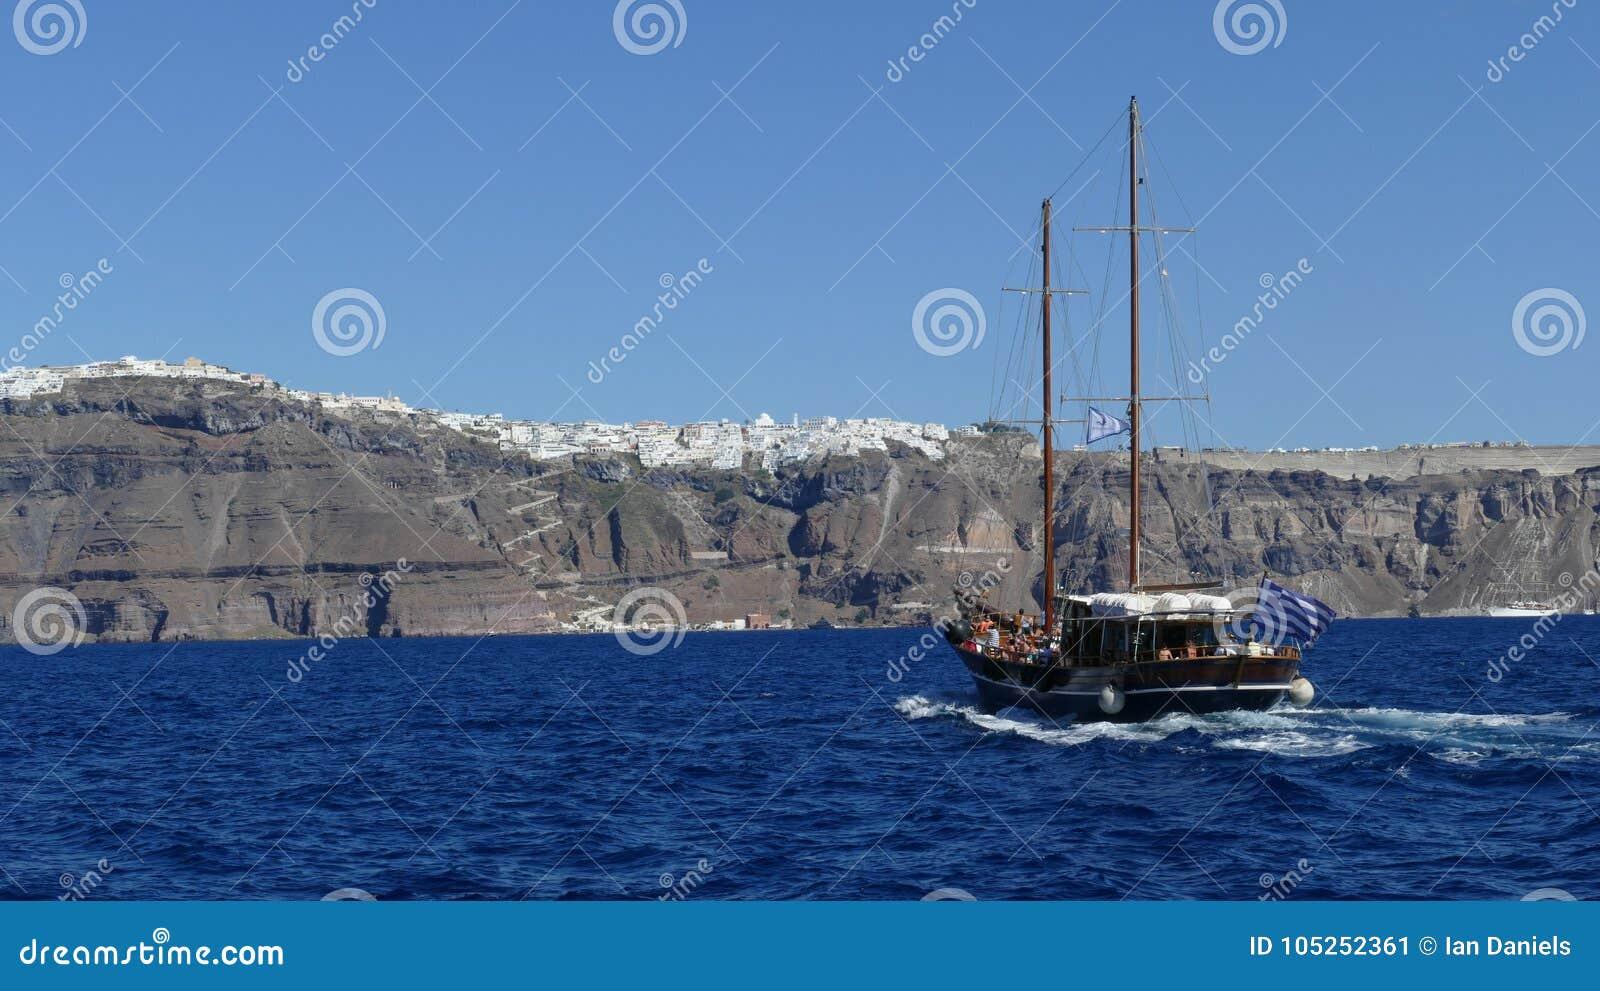 Boat heading towards the town of Fira in Santorini